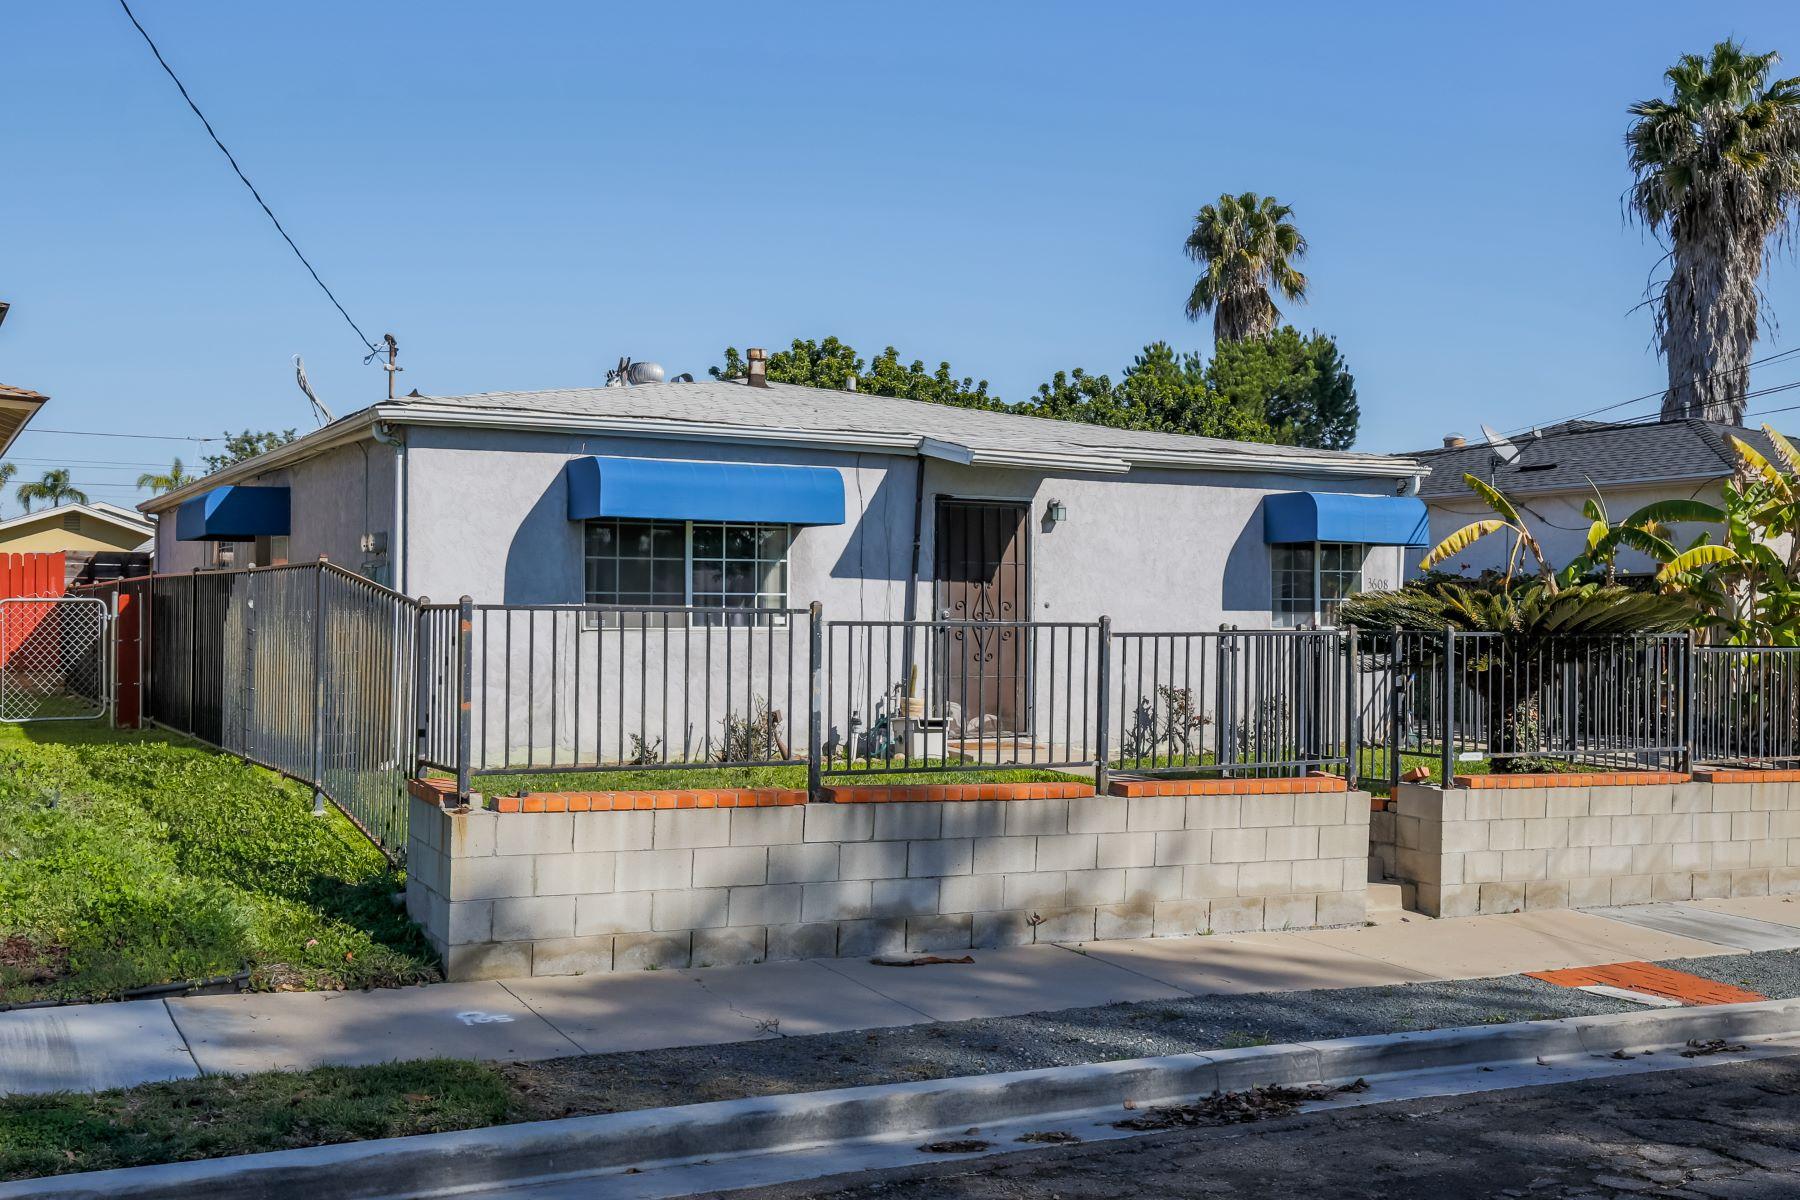 Duplex Homes 为 销售 在 3608-10 Collier 圣地亚哥, 加利福尼亚州 92116 美国